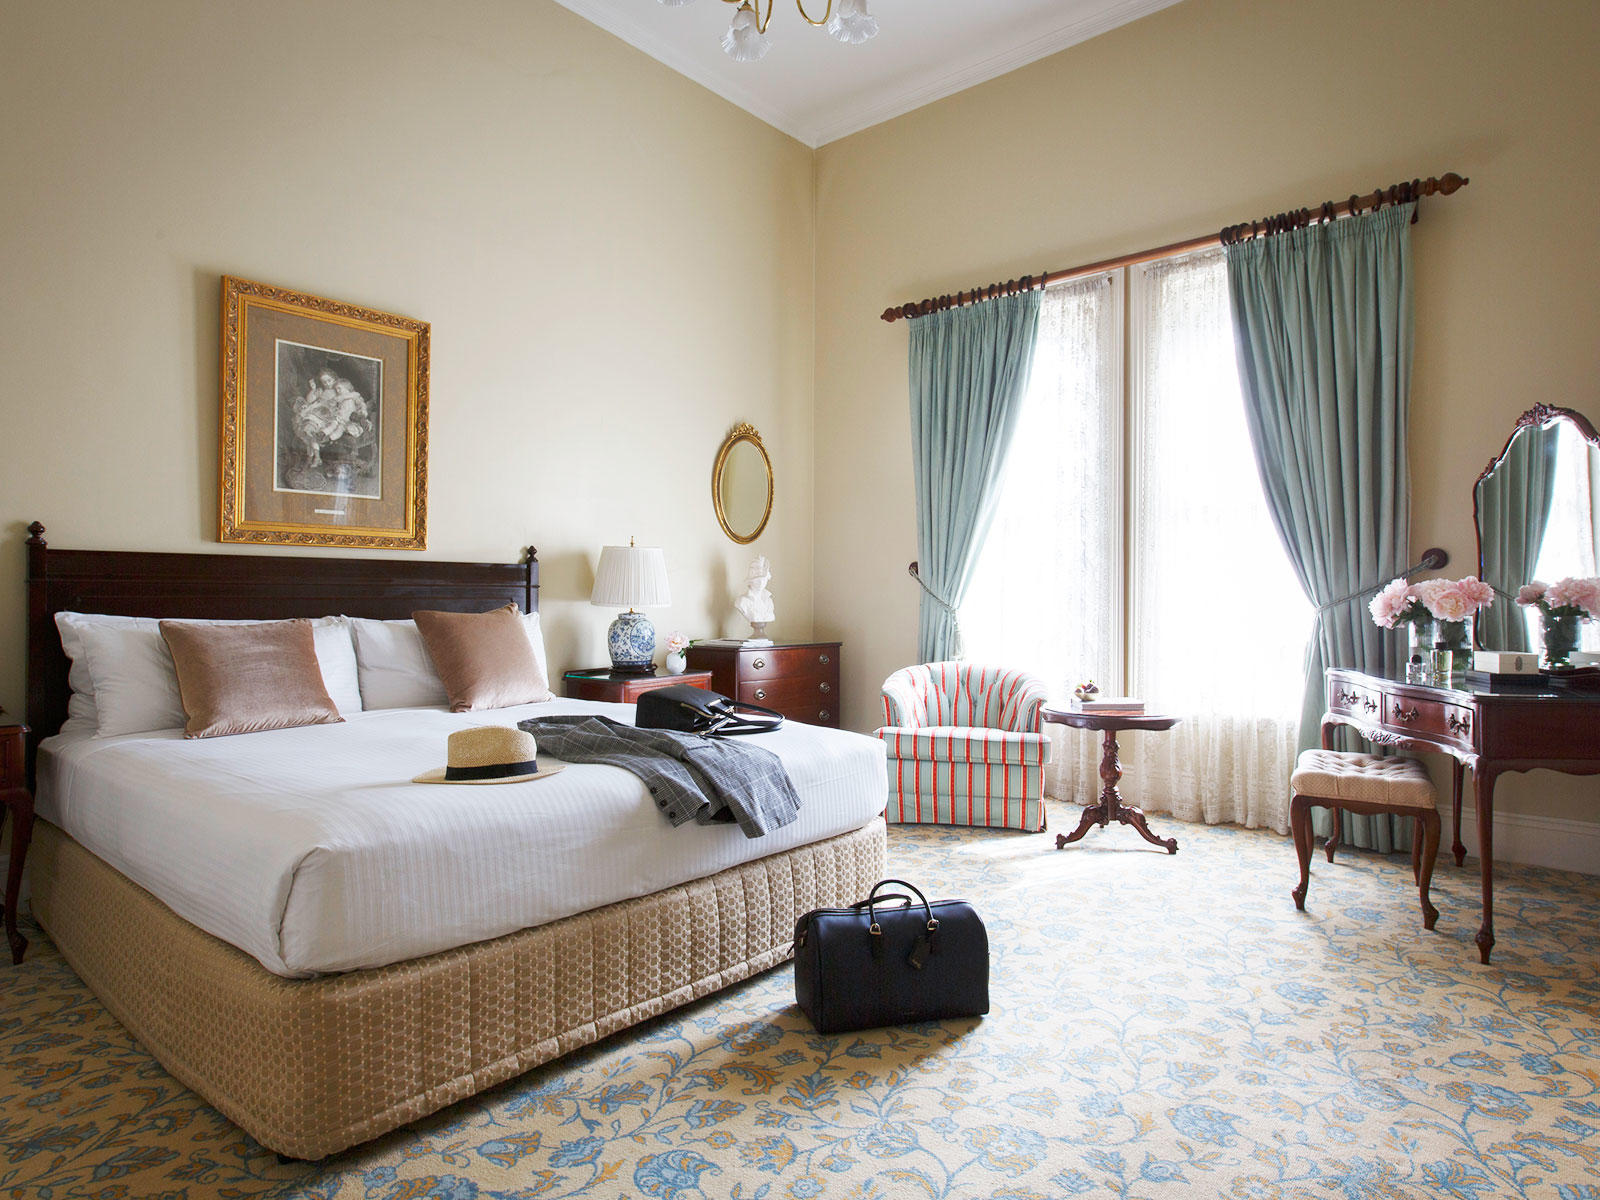 Victorian Suite Bedroom at The Hotel Windsor Melbourne